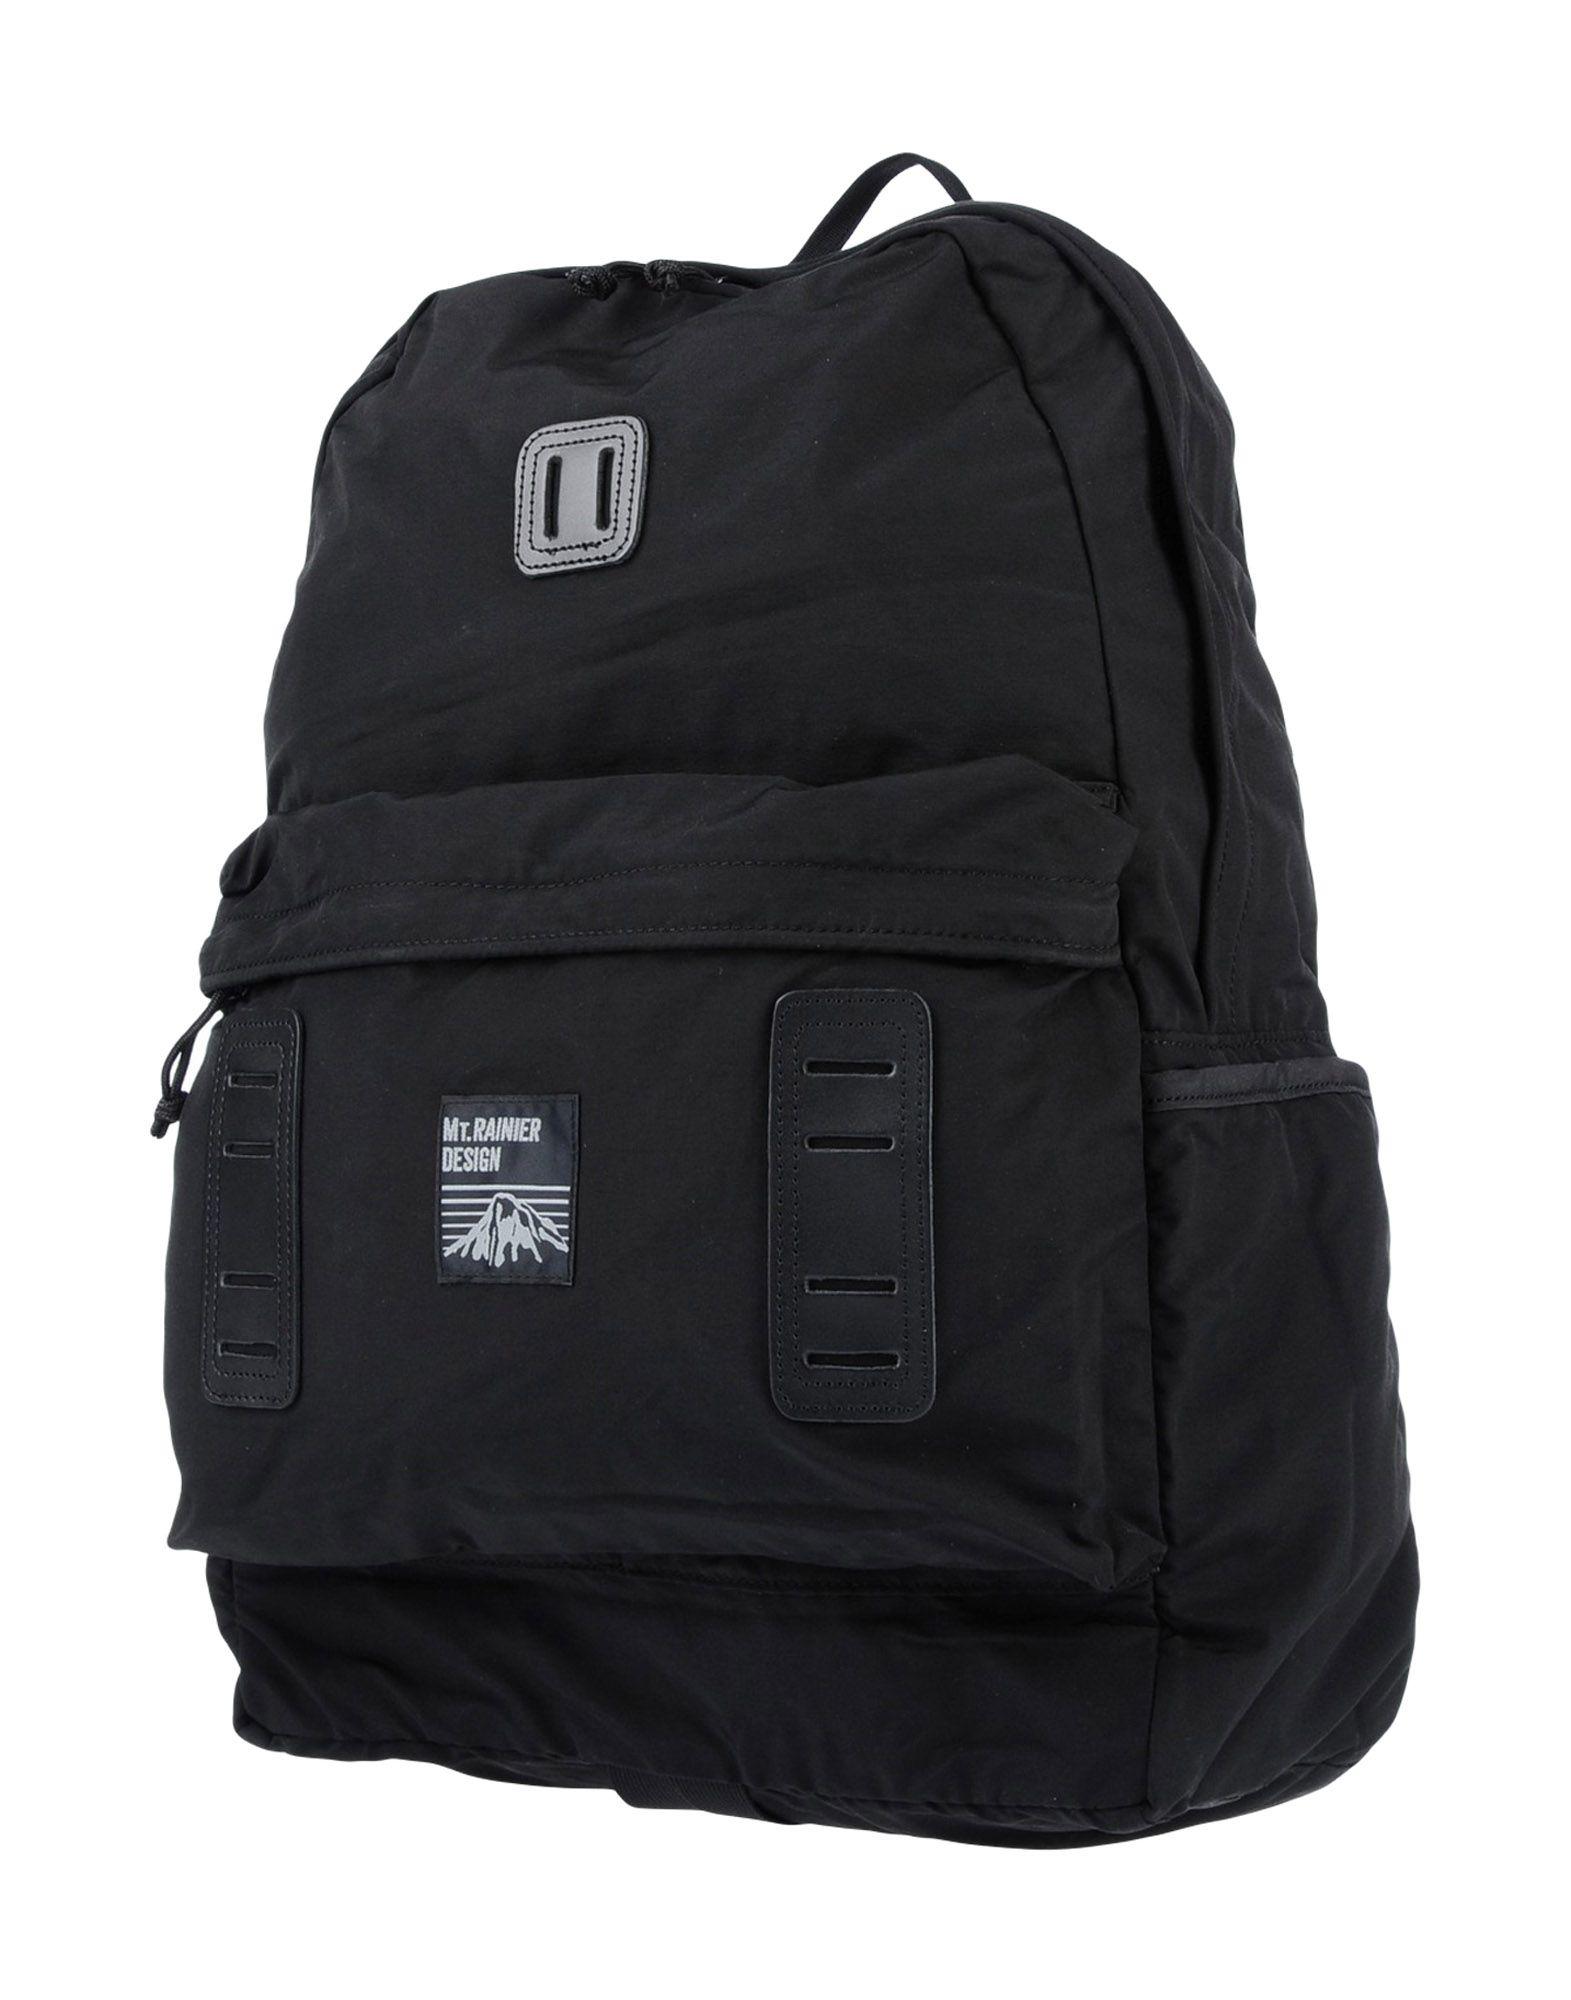 MT. RAINIER DESIGN Backpack & Fanny Pack in Black